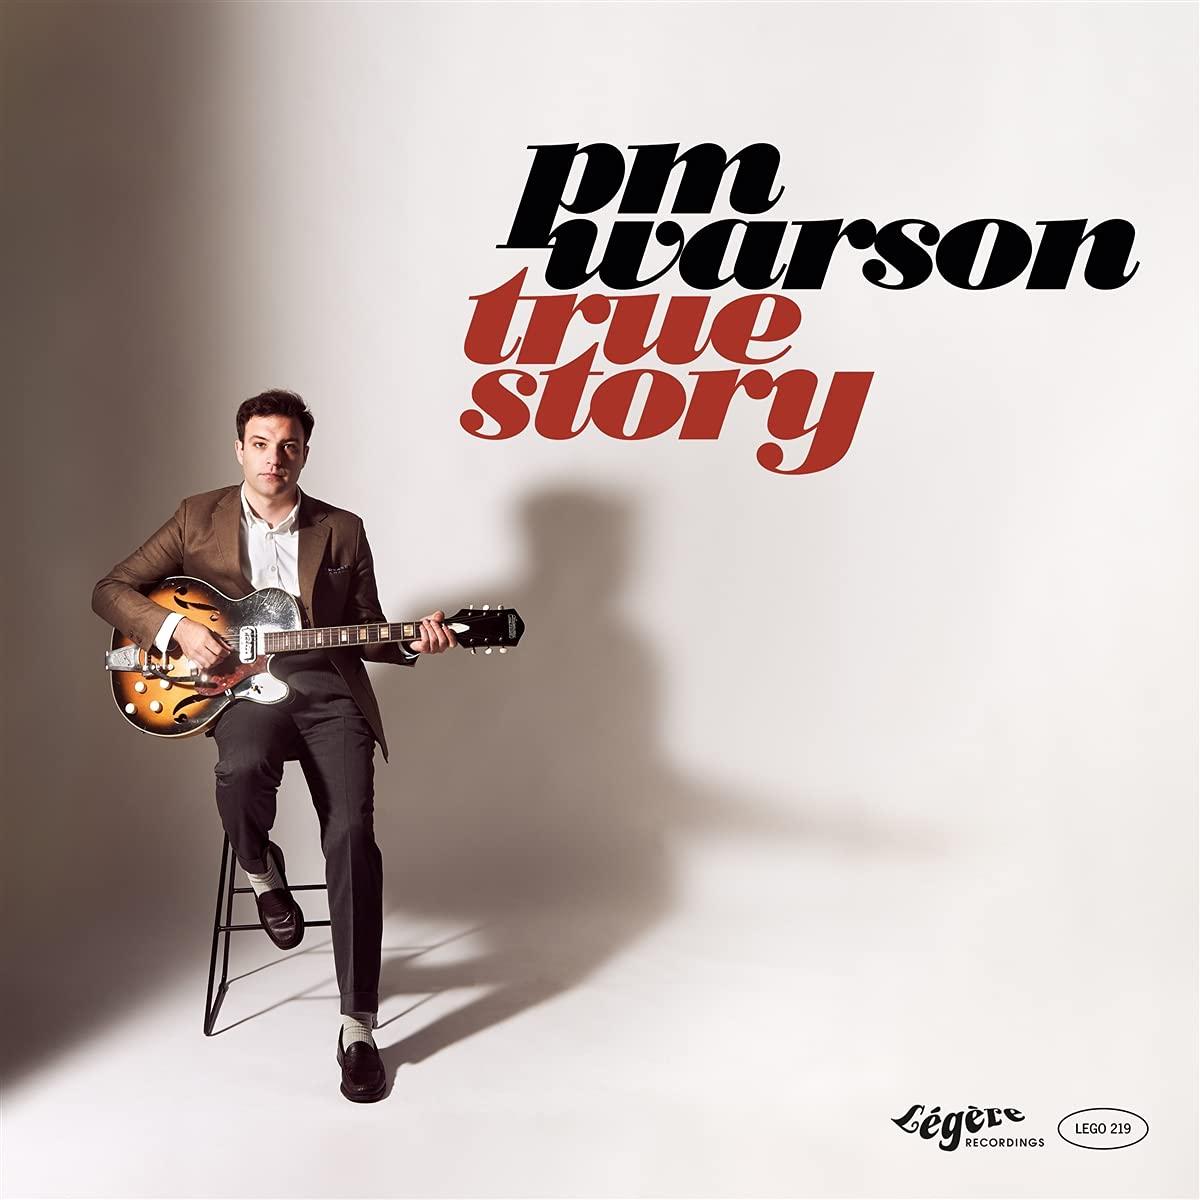 PM Warson - True Story (2021) [FLAC] Download